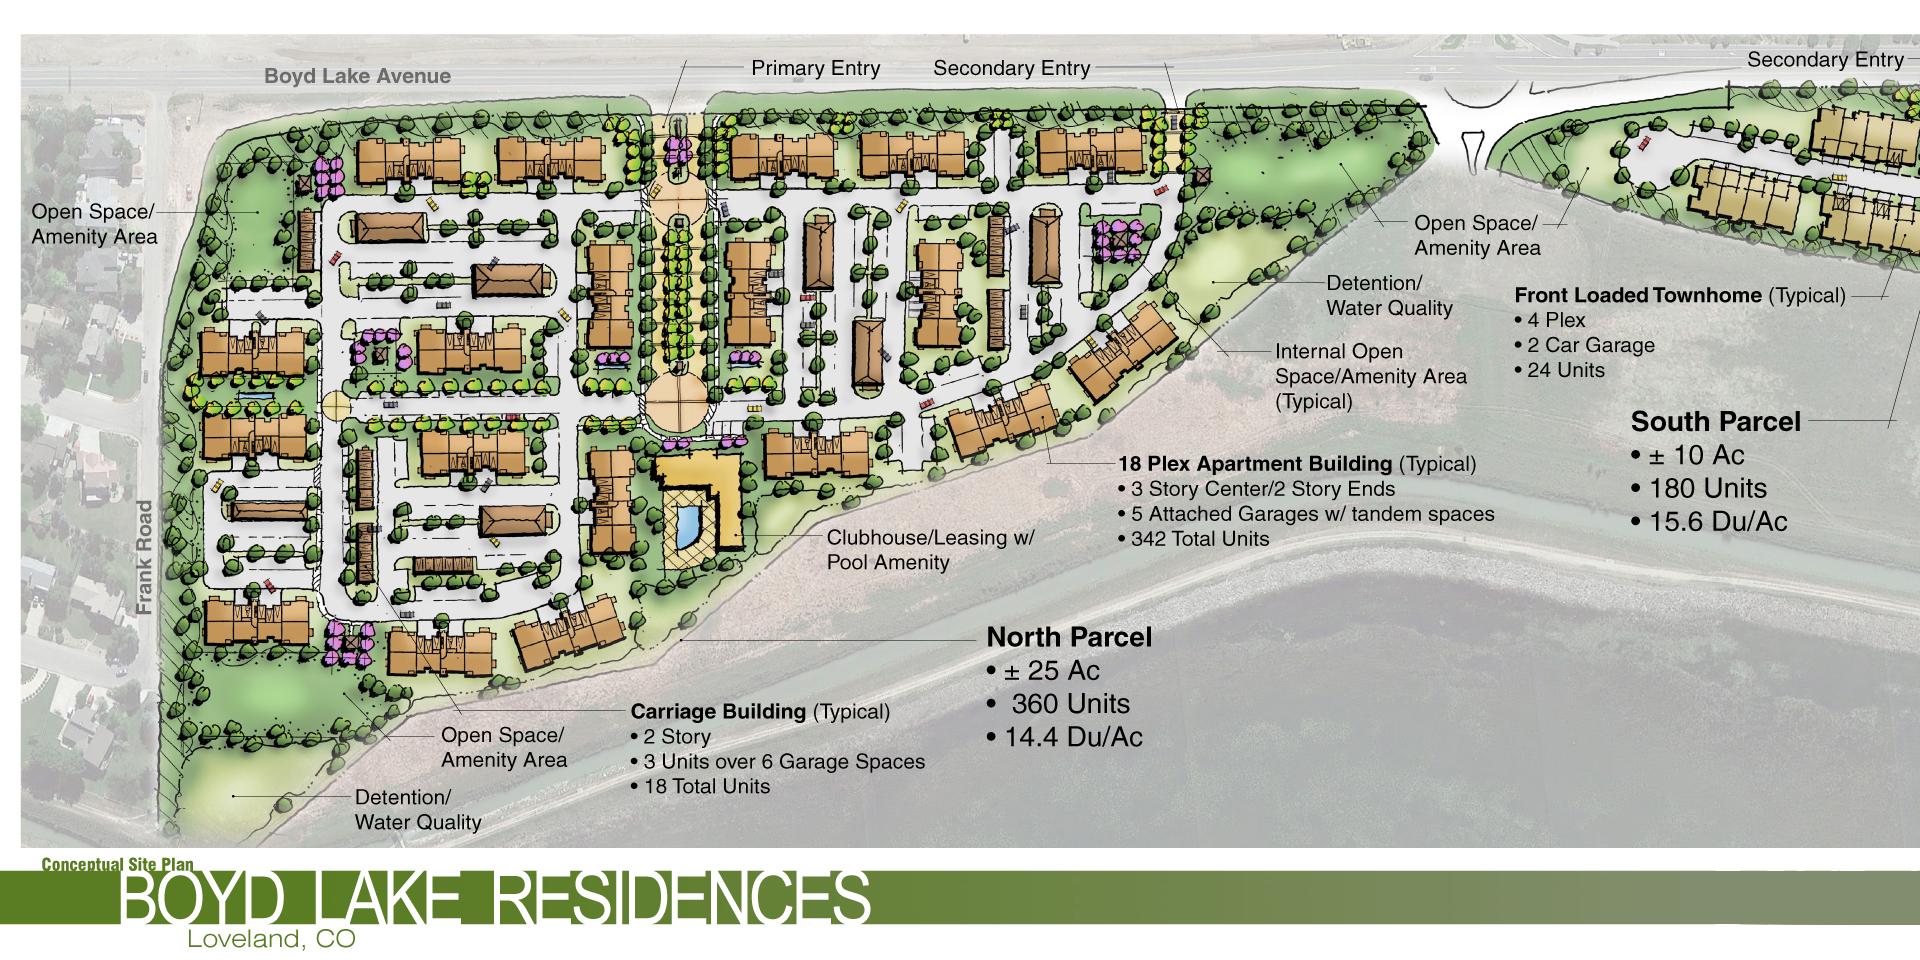 Land planning graphic